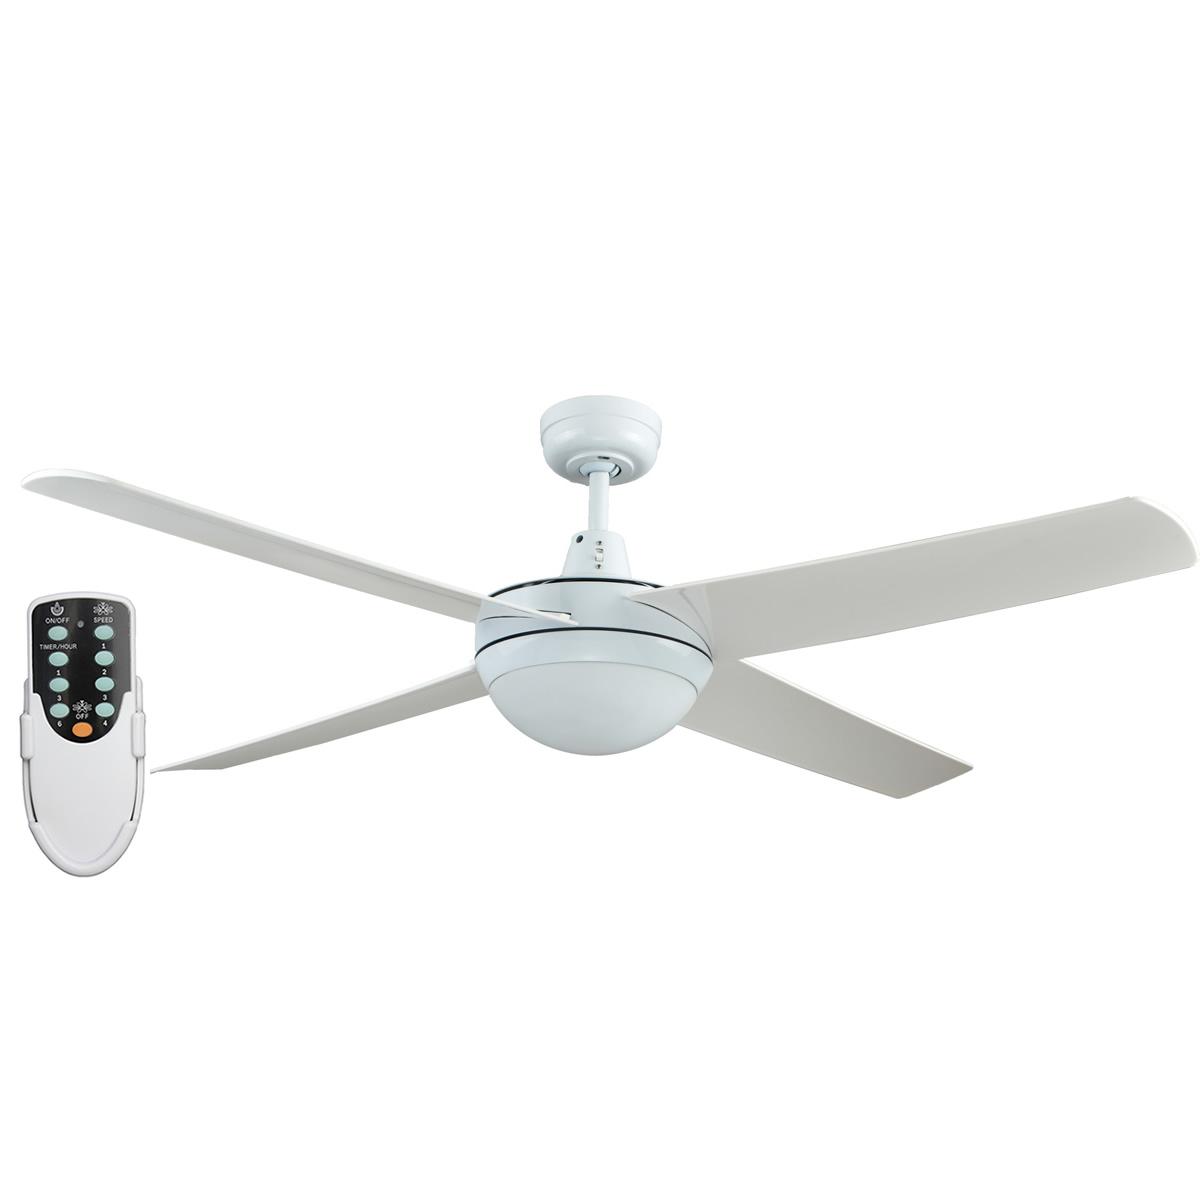 28 Ceiling Fan 52 Inch Remote